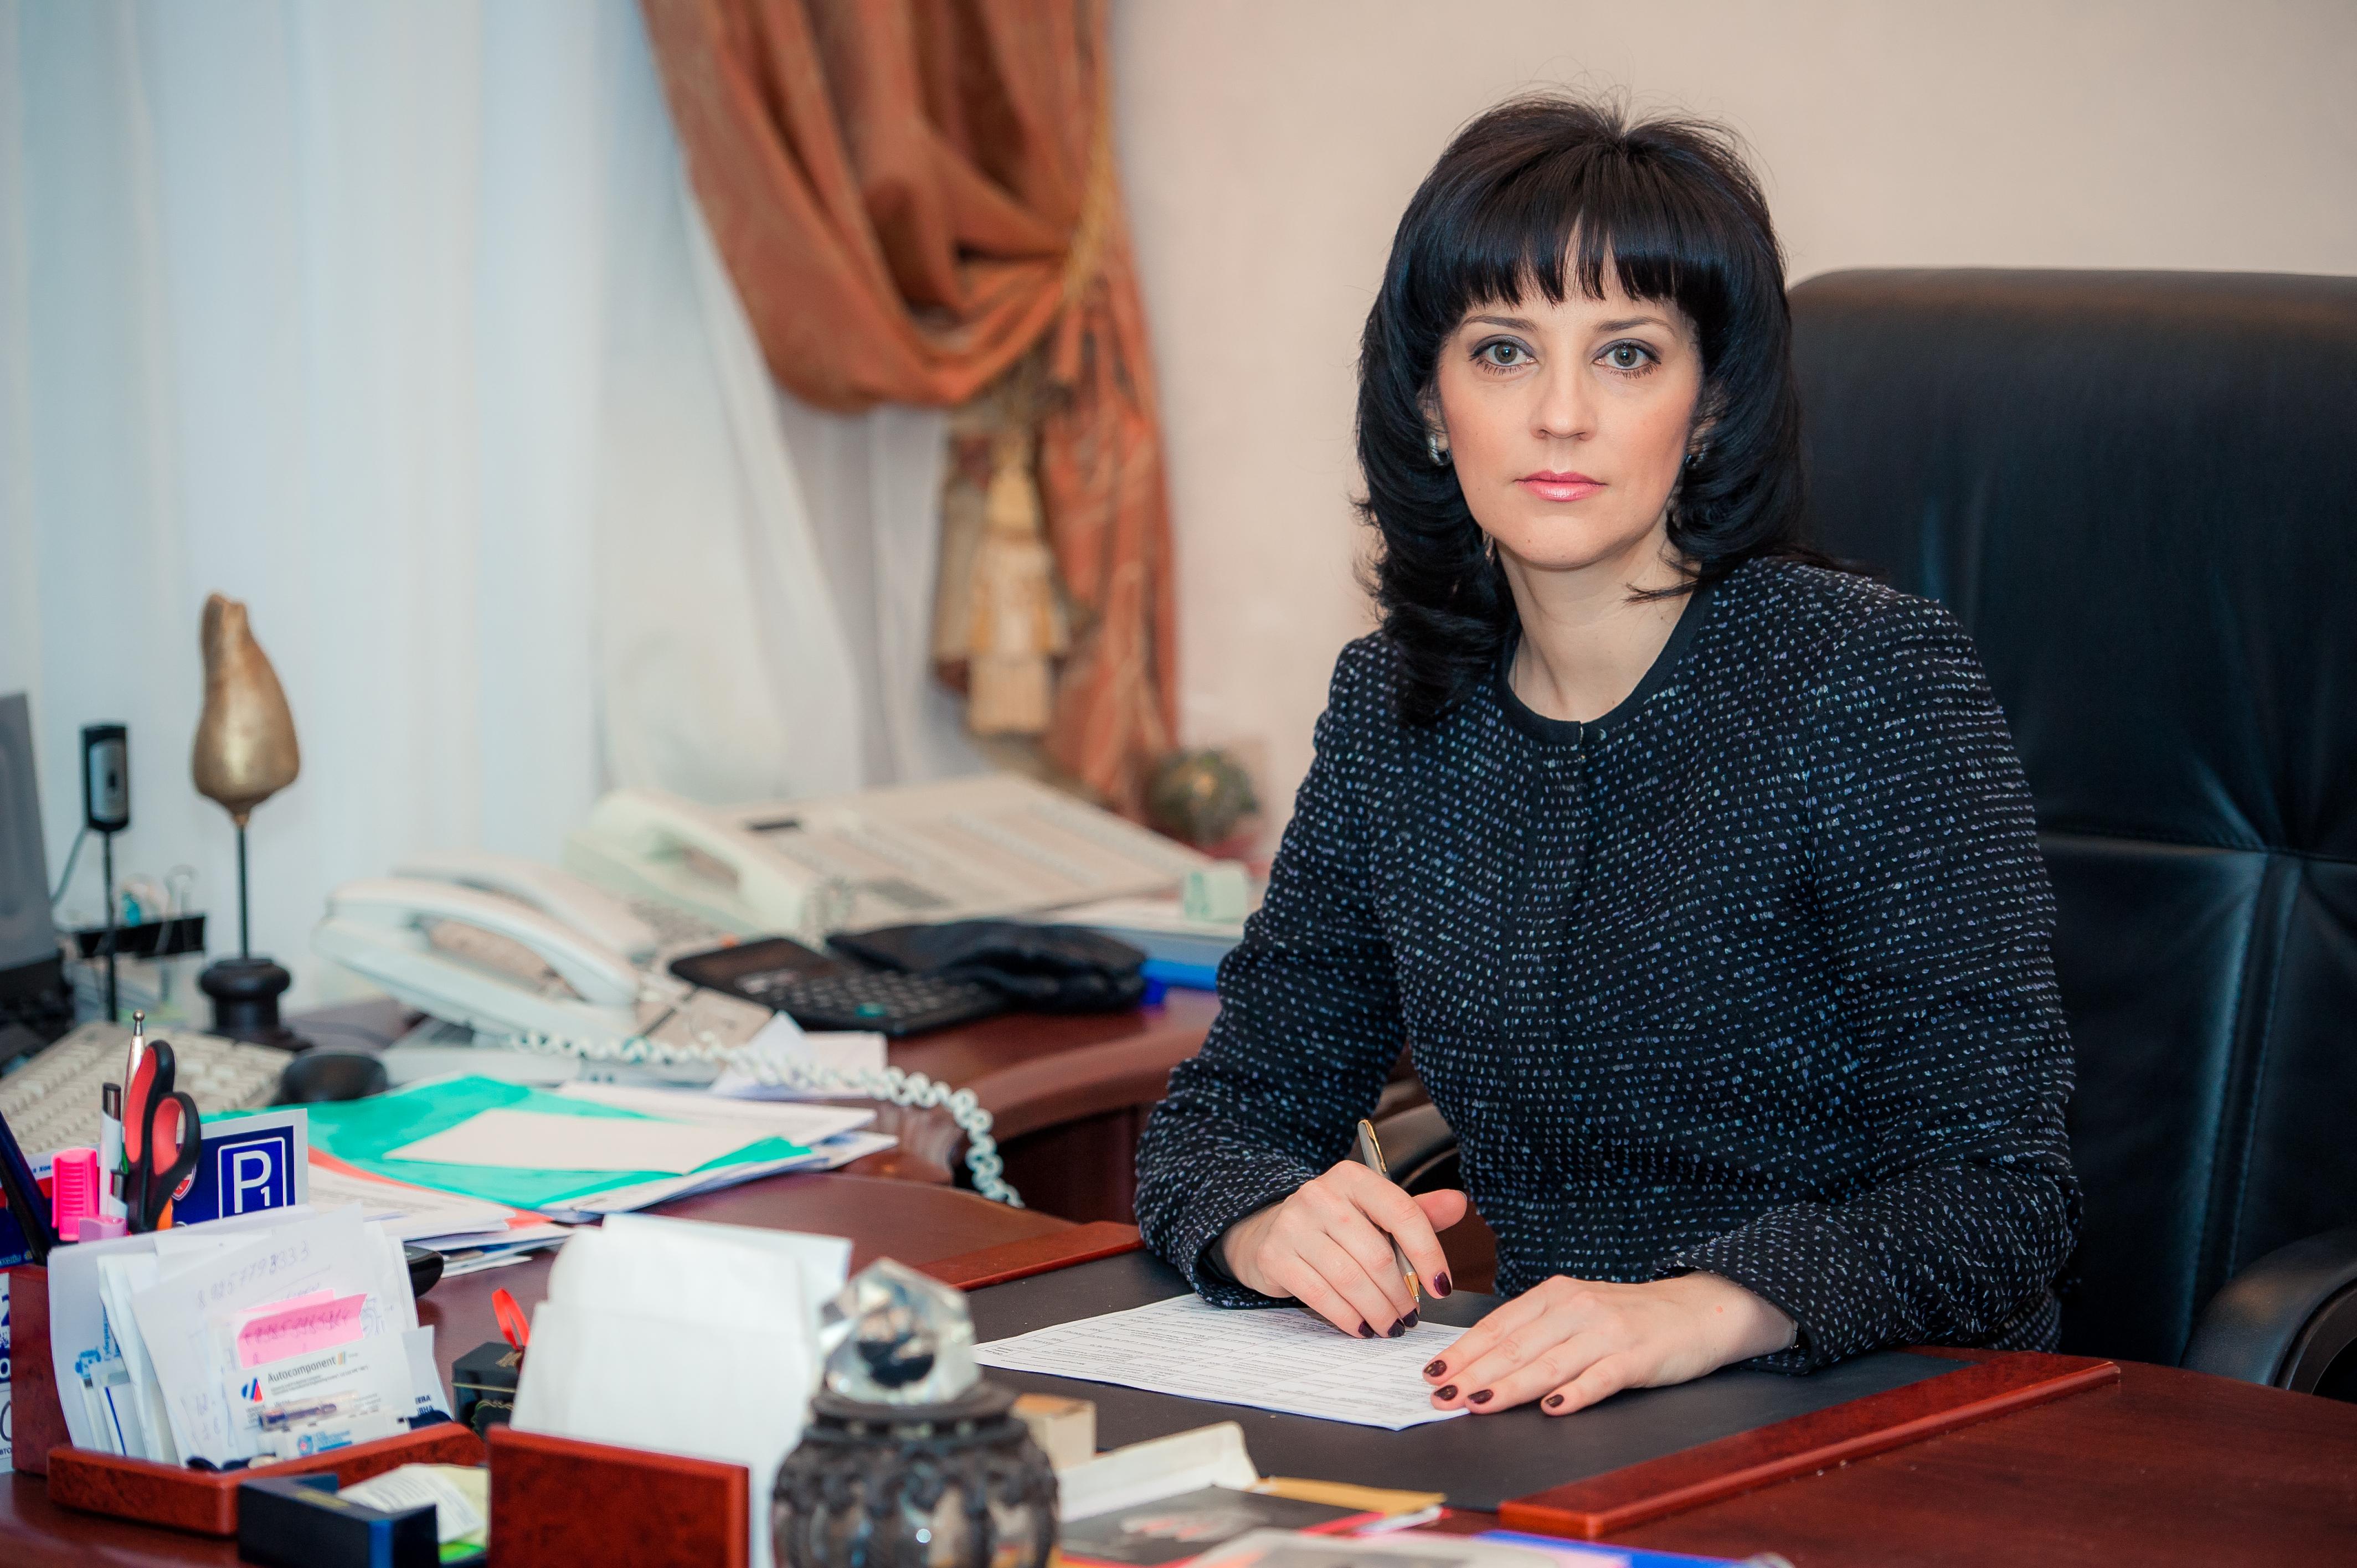 Наталья гольдяева нижний новгород